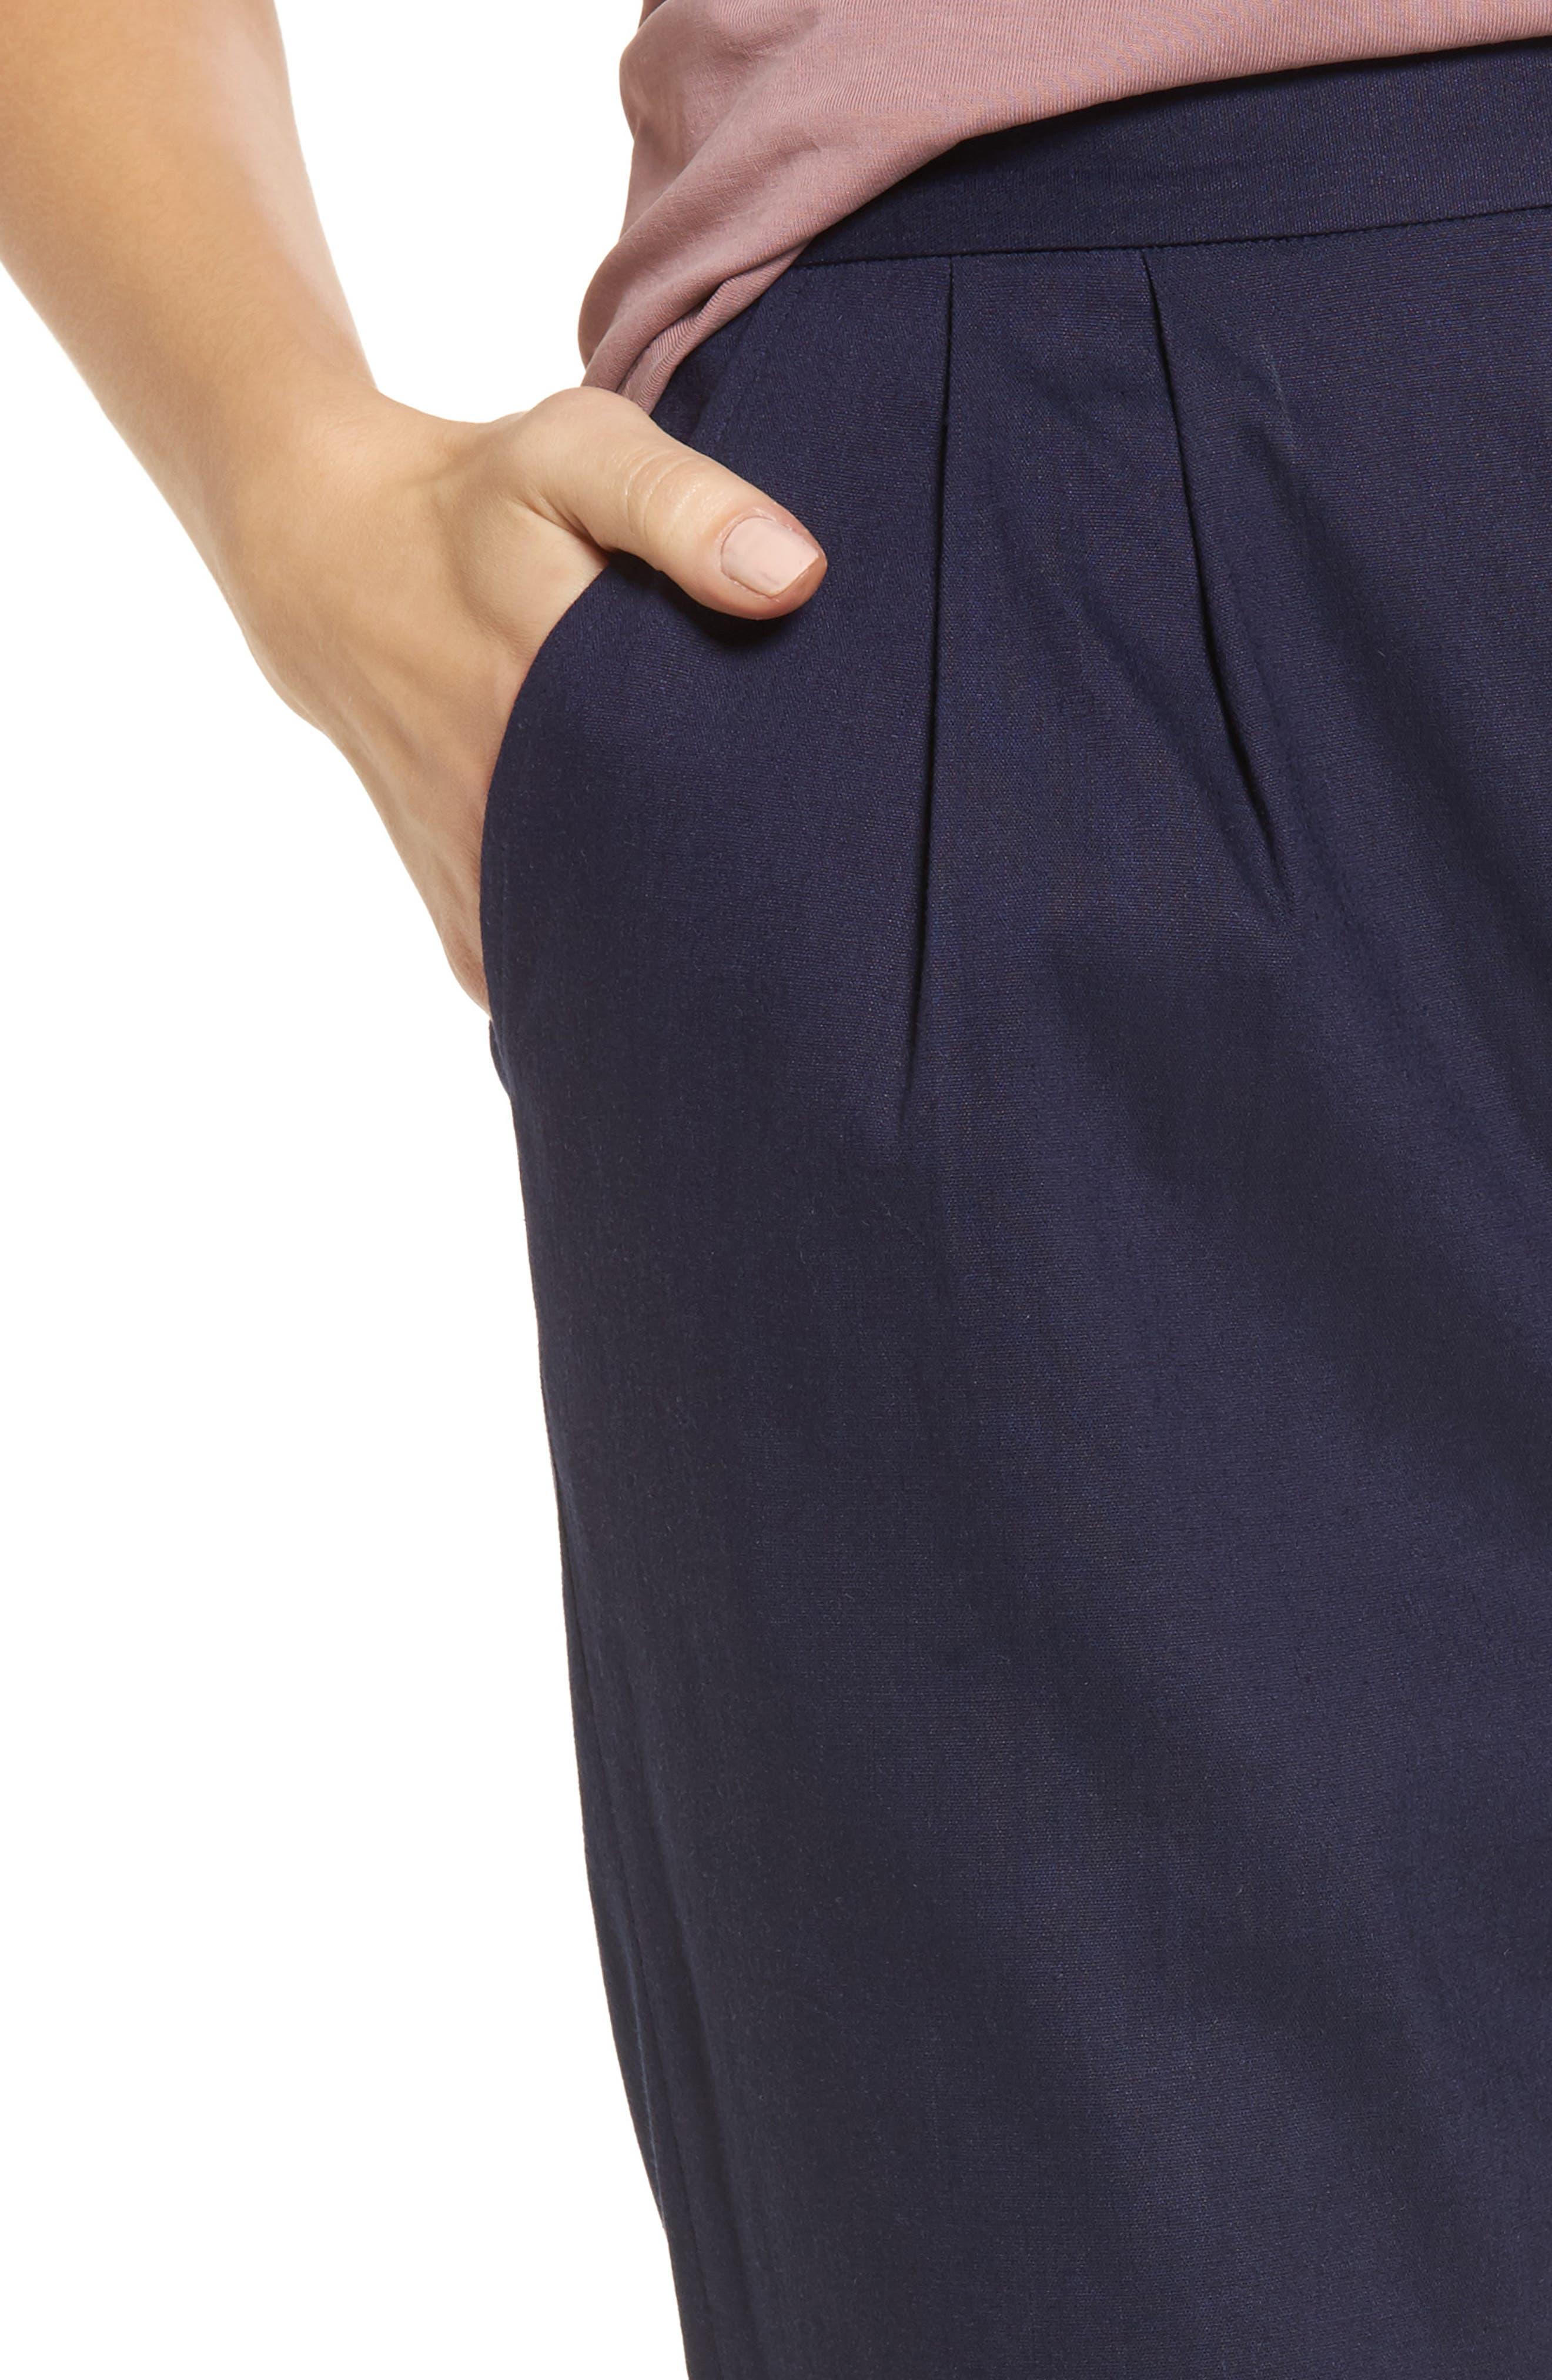 Pleat Front Crop Pants,                             Alternate thumbnail 4, color,                             Navy Evening